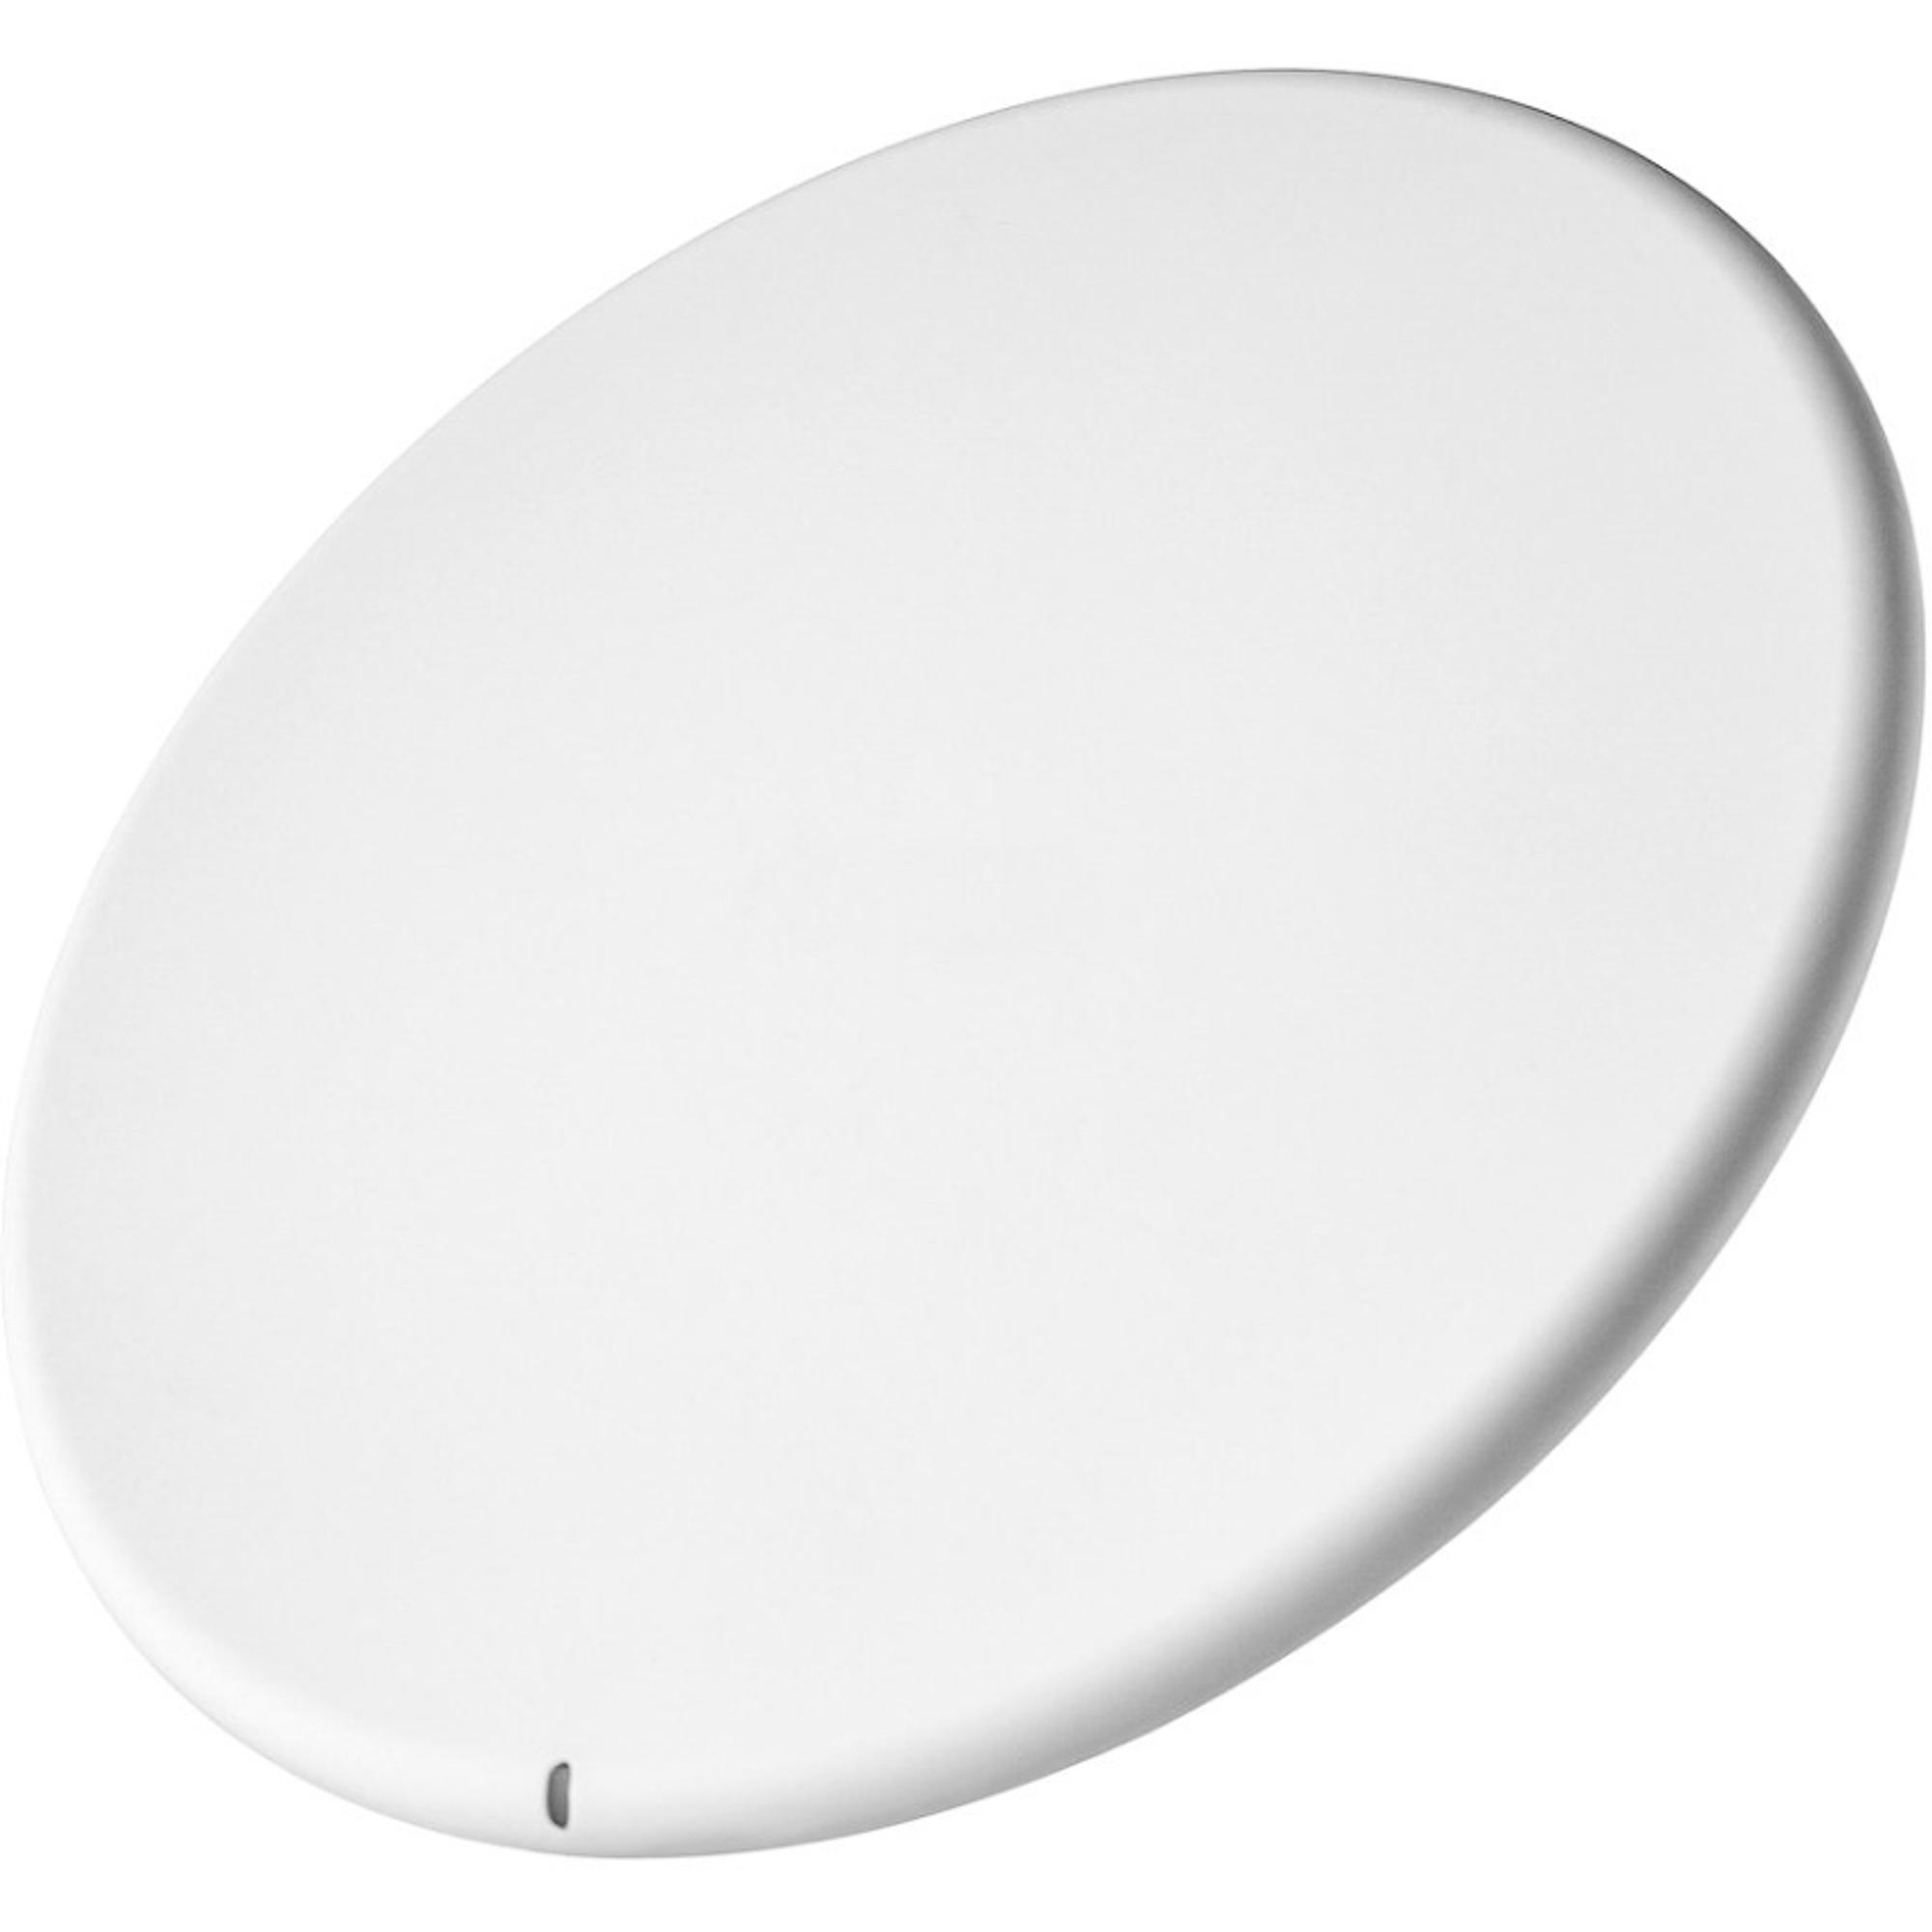 Фото - Беспроводное зарядное устройство uBear Flow Wireless Charger белый WL02WH10-AD беспроводное зар устр upvel 1 5a